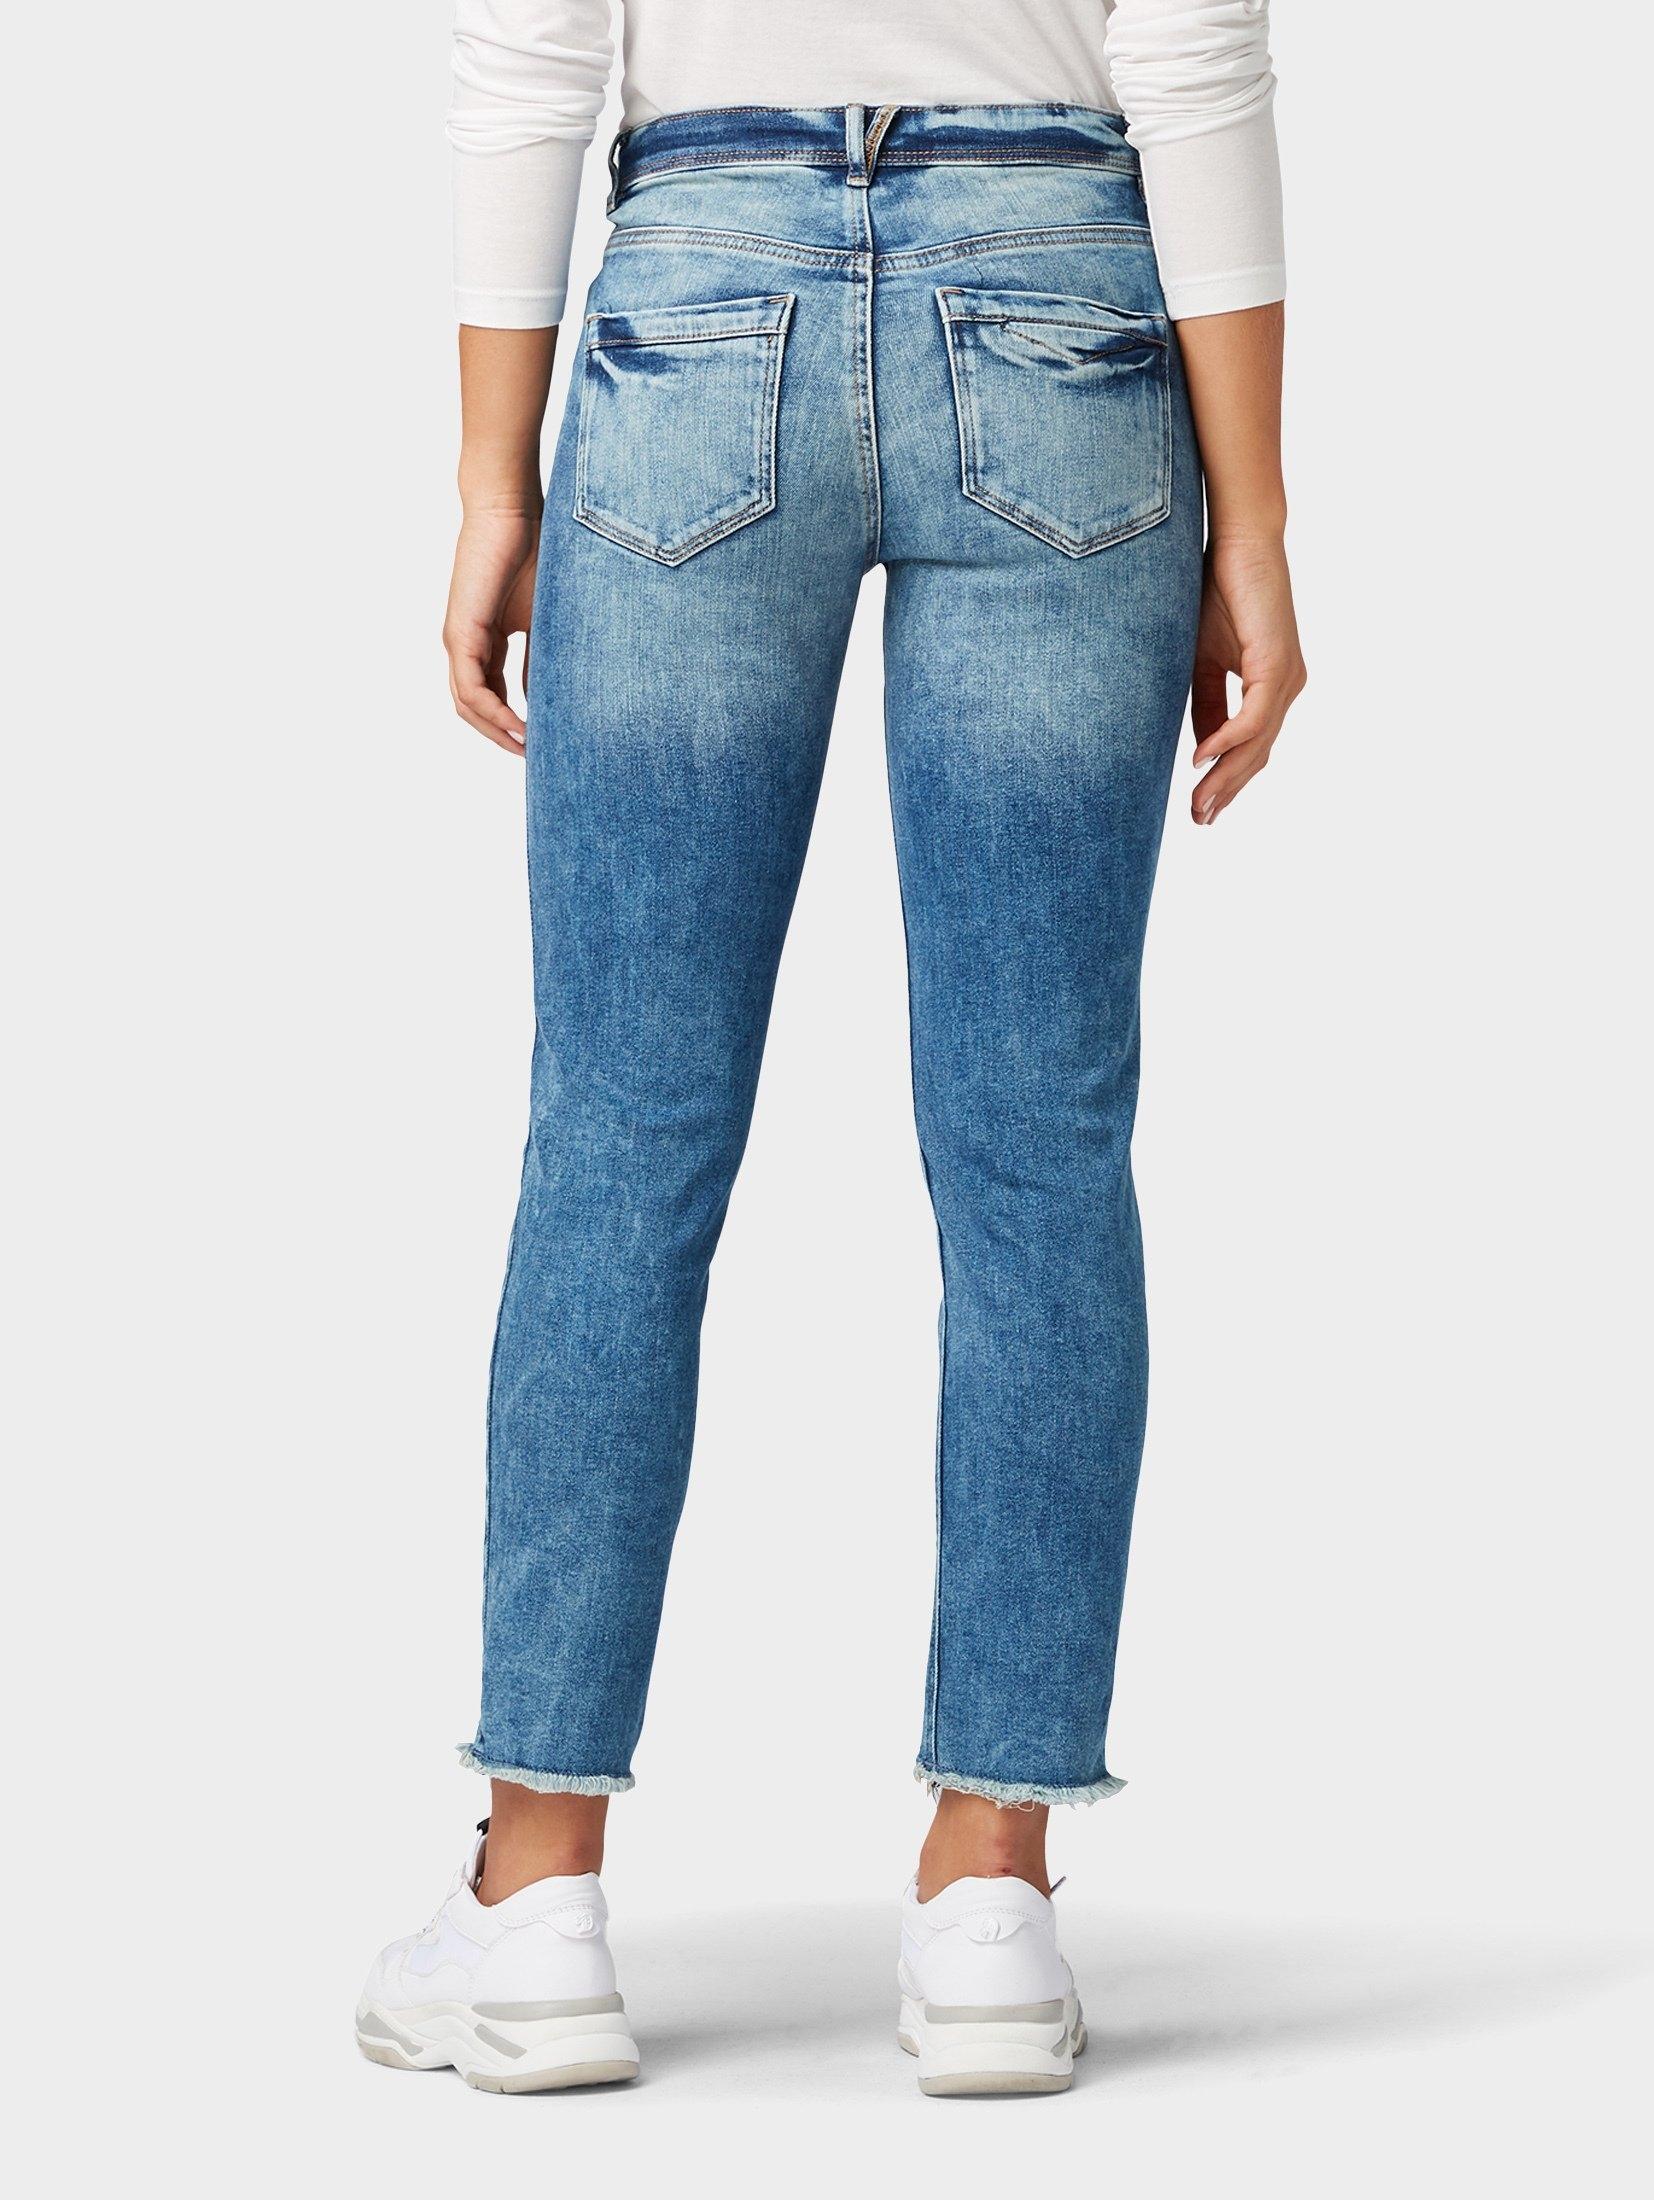 TOM TAILOR slim fit jeans »Kate slim jeans in enkellengte« bij OTTO online kopen